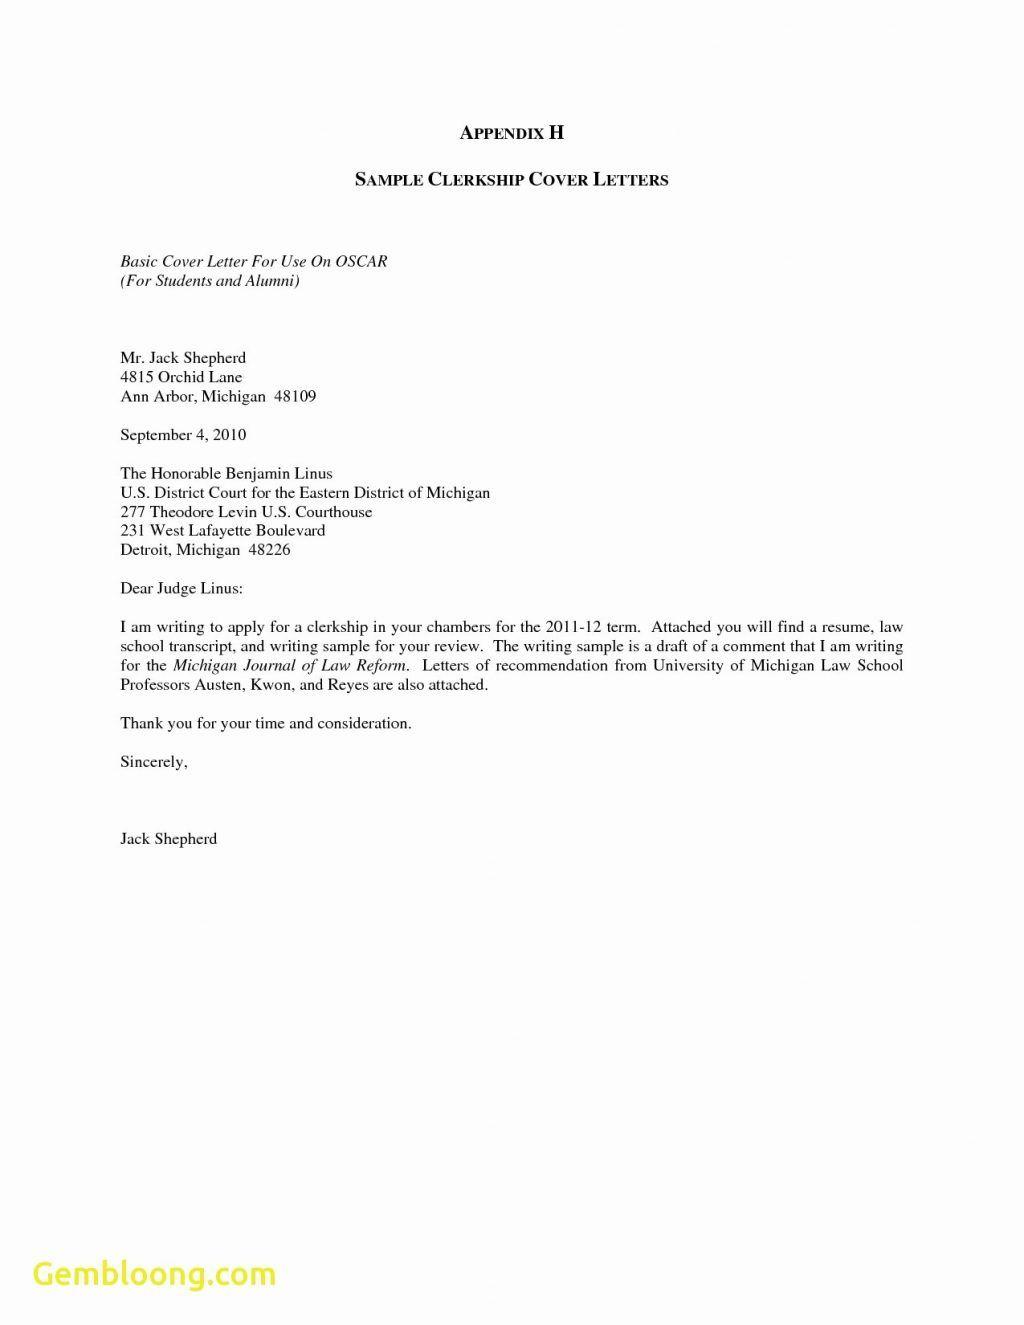 Graduate School Application Cover Letters Roanoke College